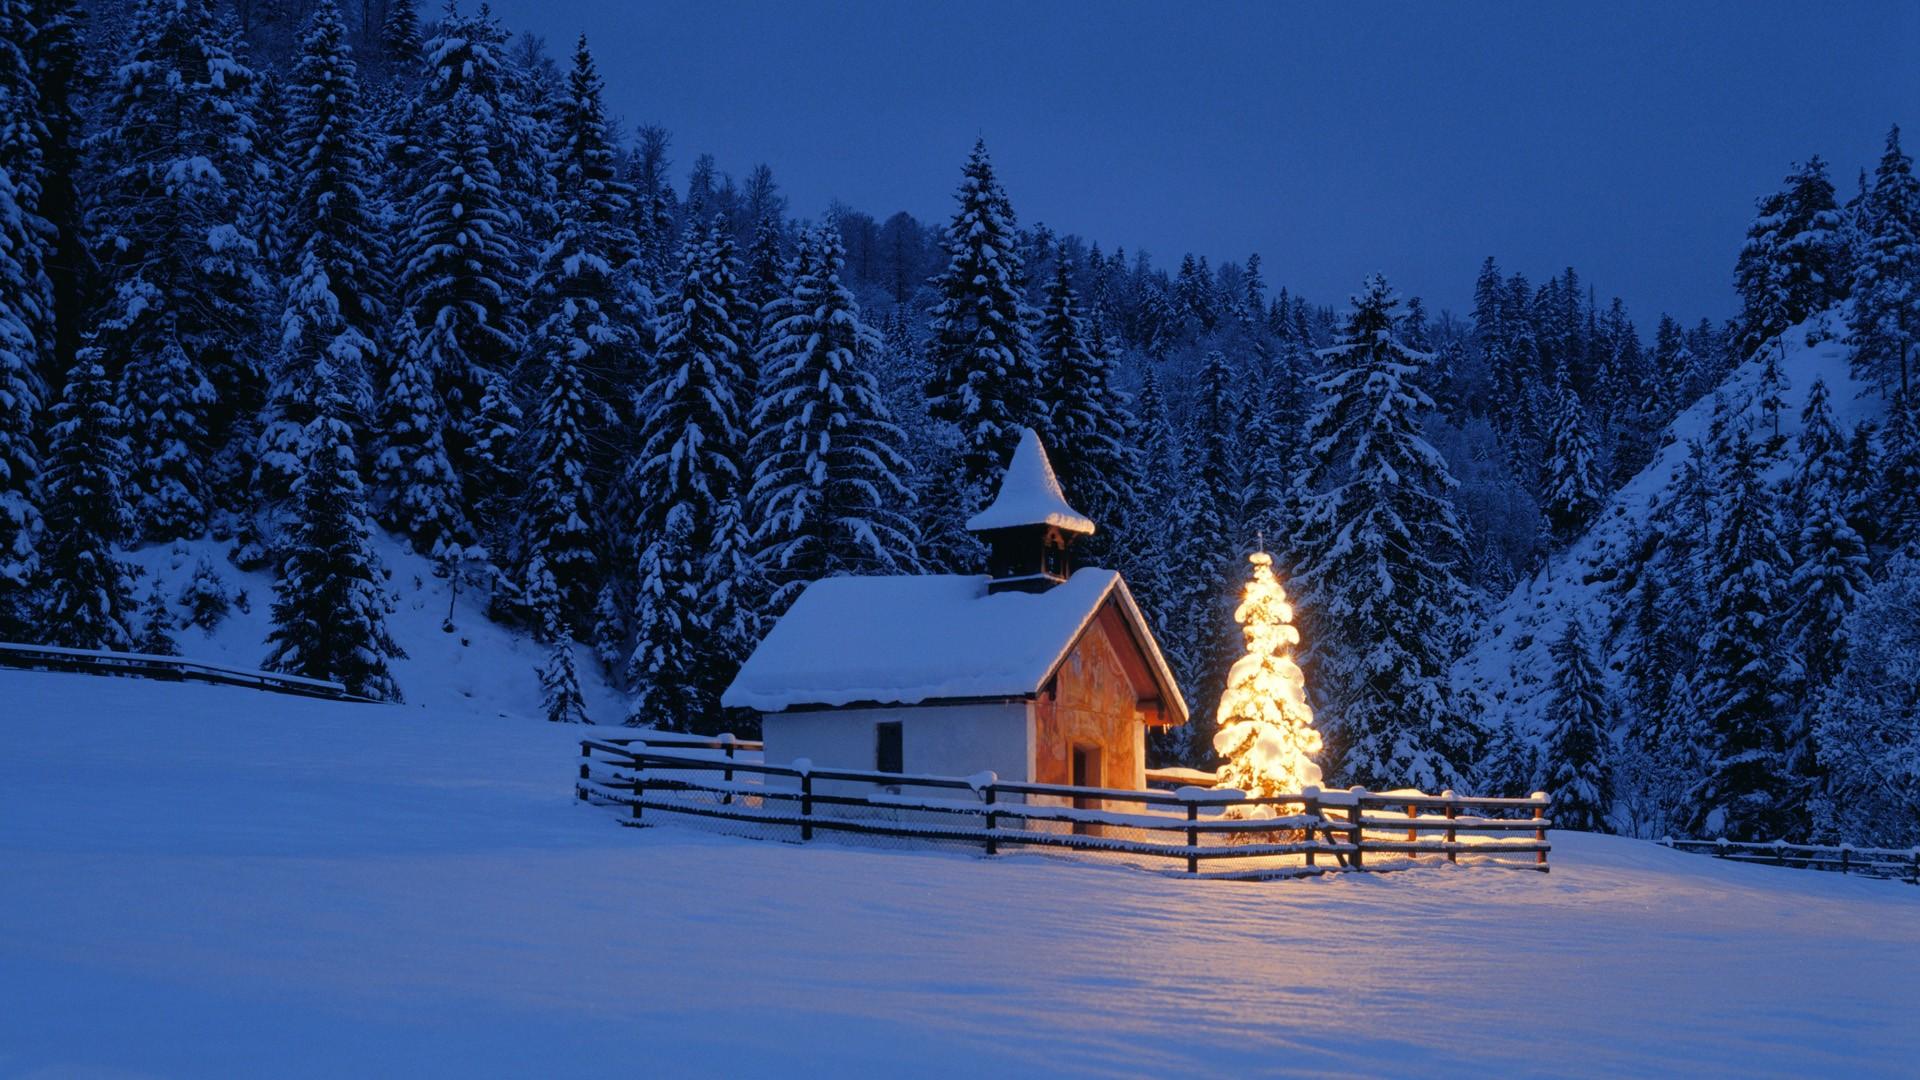 Germany Christmas Wallpaper 1920x1080 Germany Christmas Trees 1920x1080